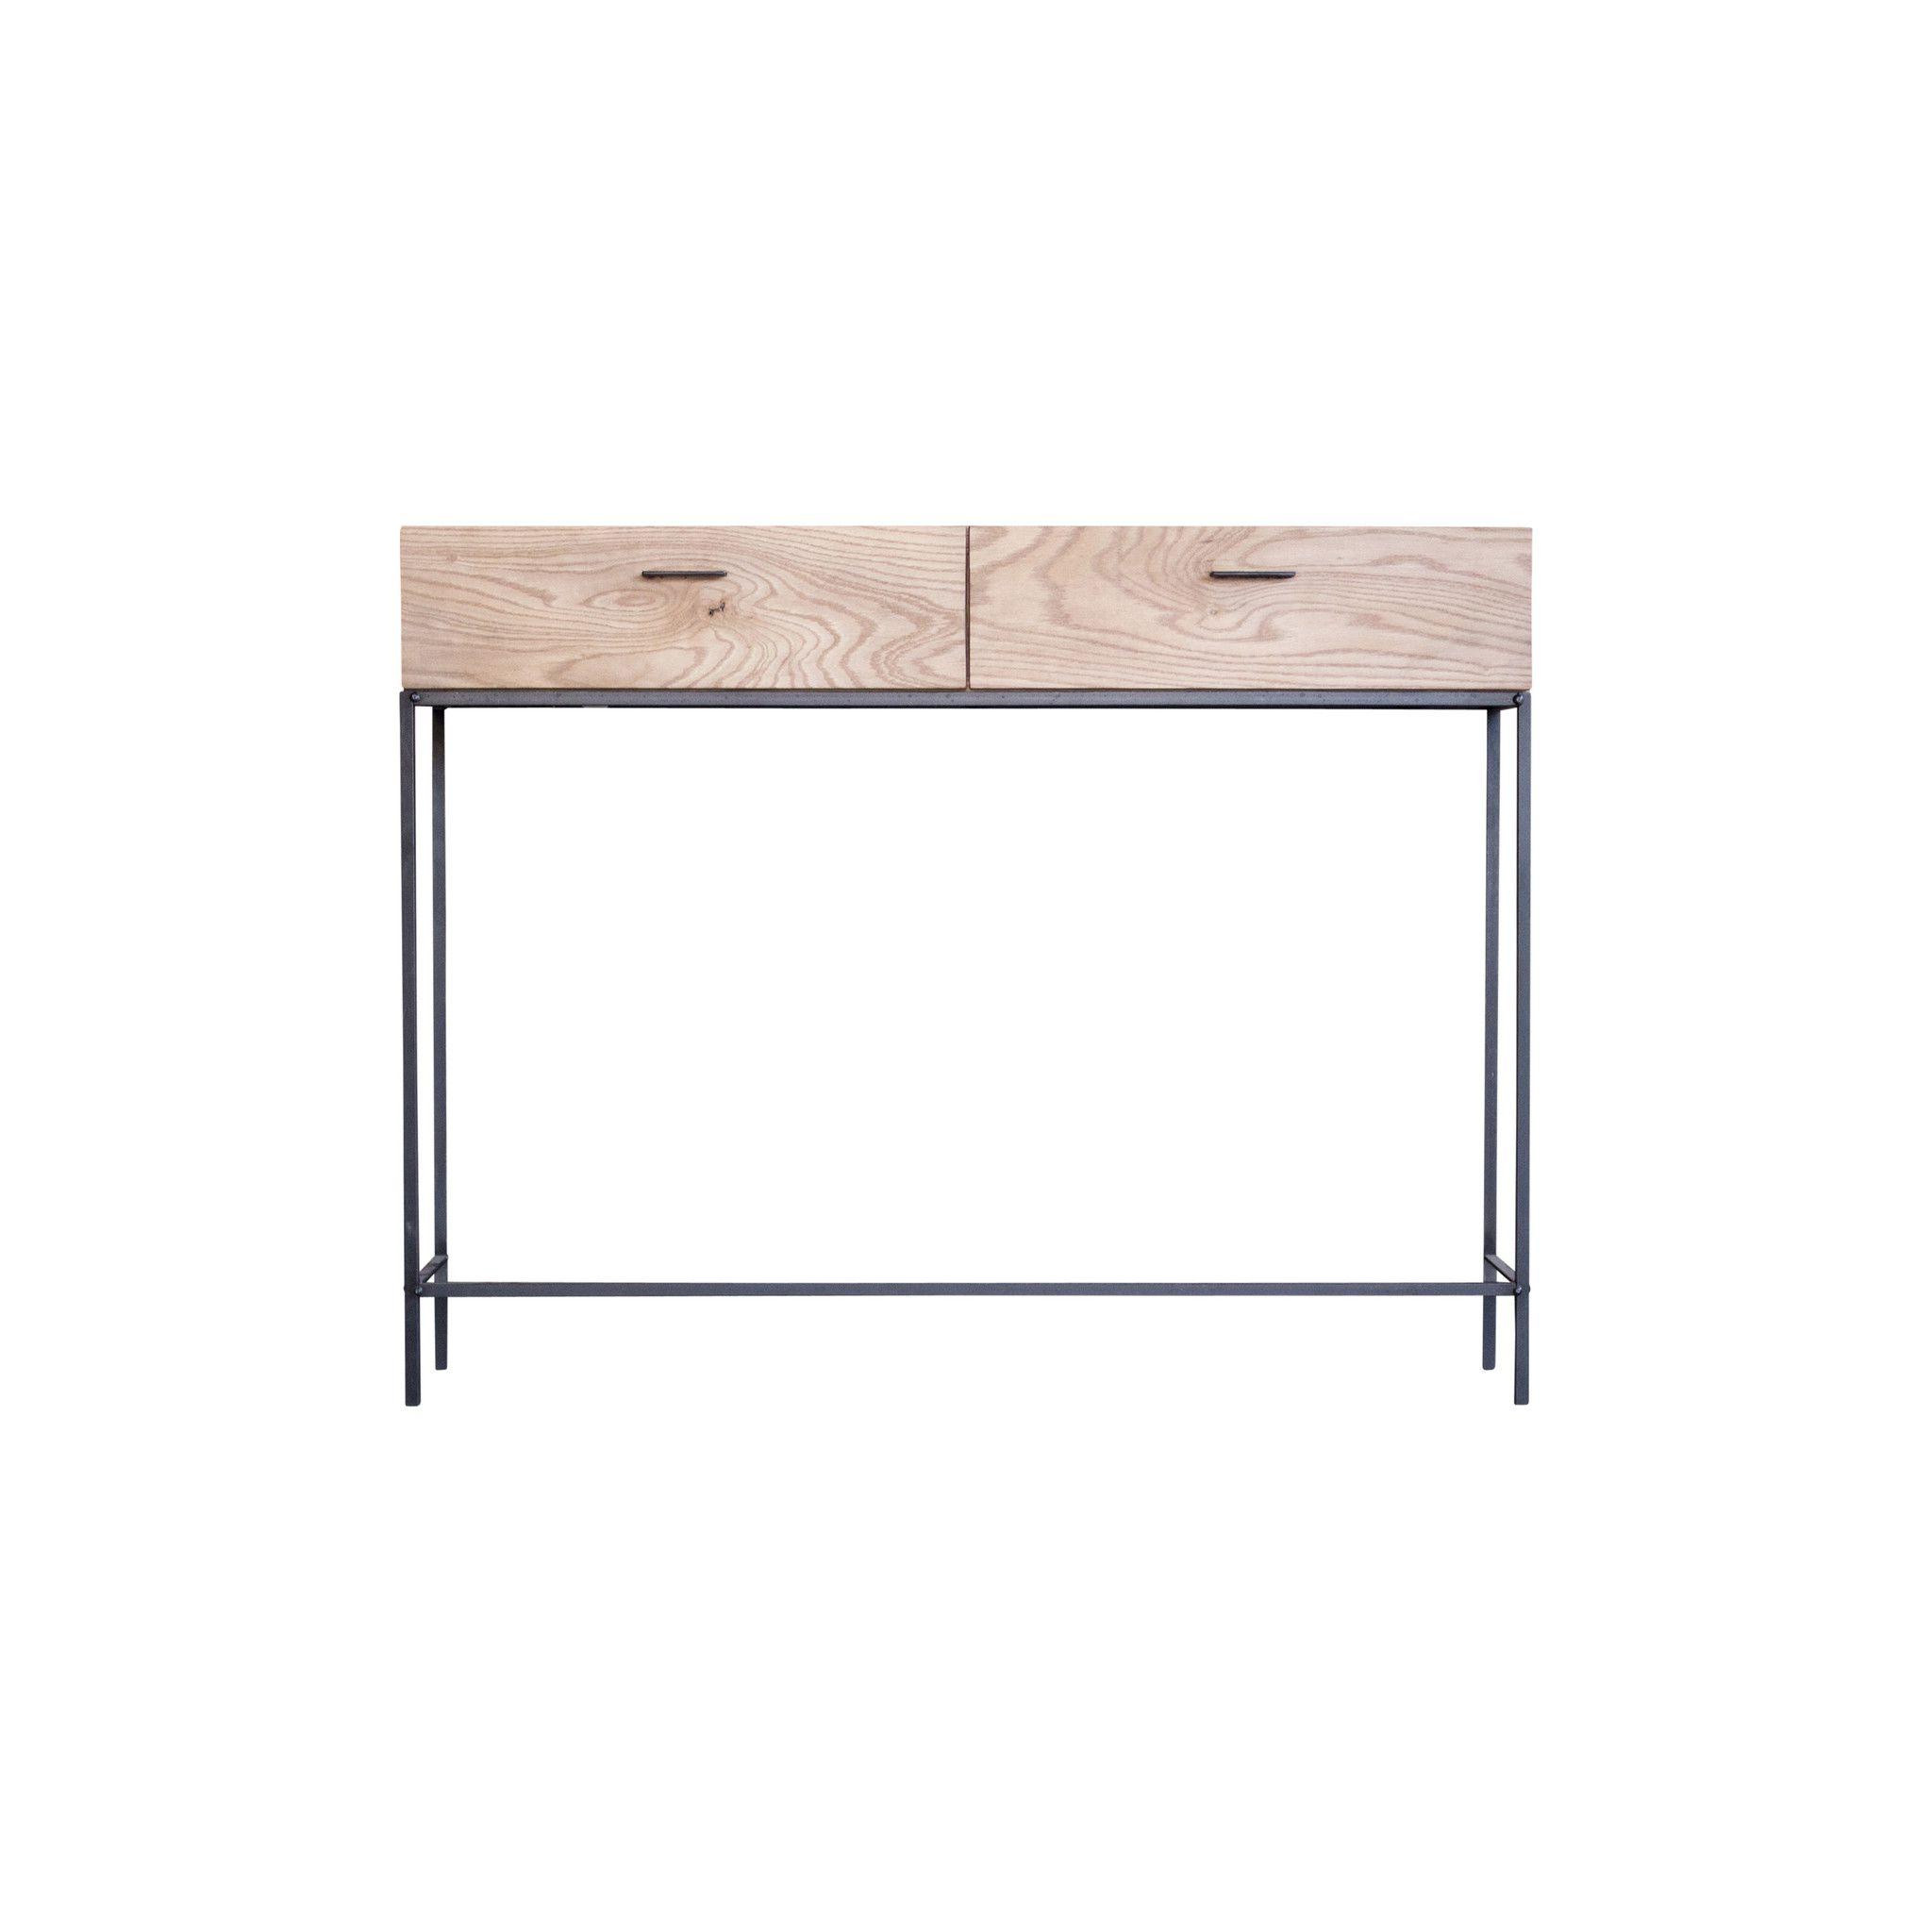 Rivera Console – Croft House | Furniture | Pinterest | Consoles Inside Clairemont Demilune Console Tables (View 14 of 20)